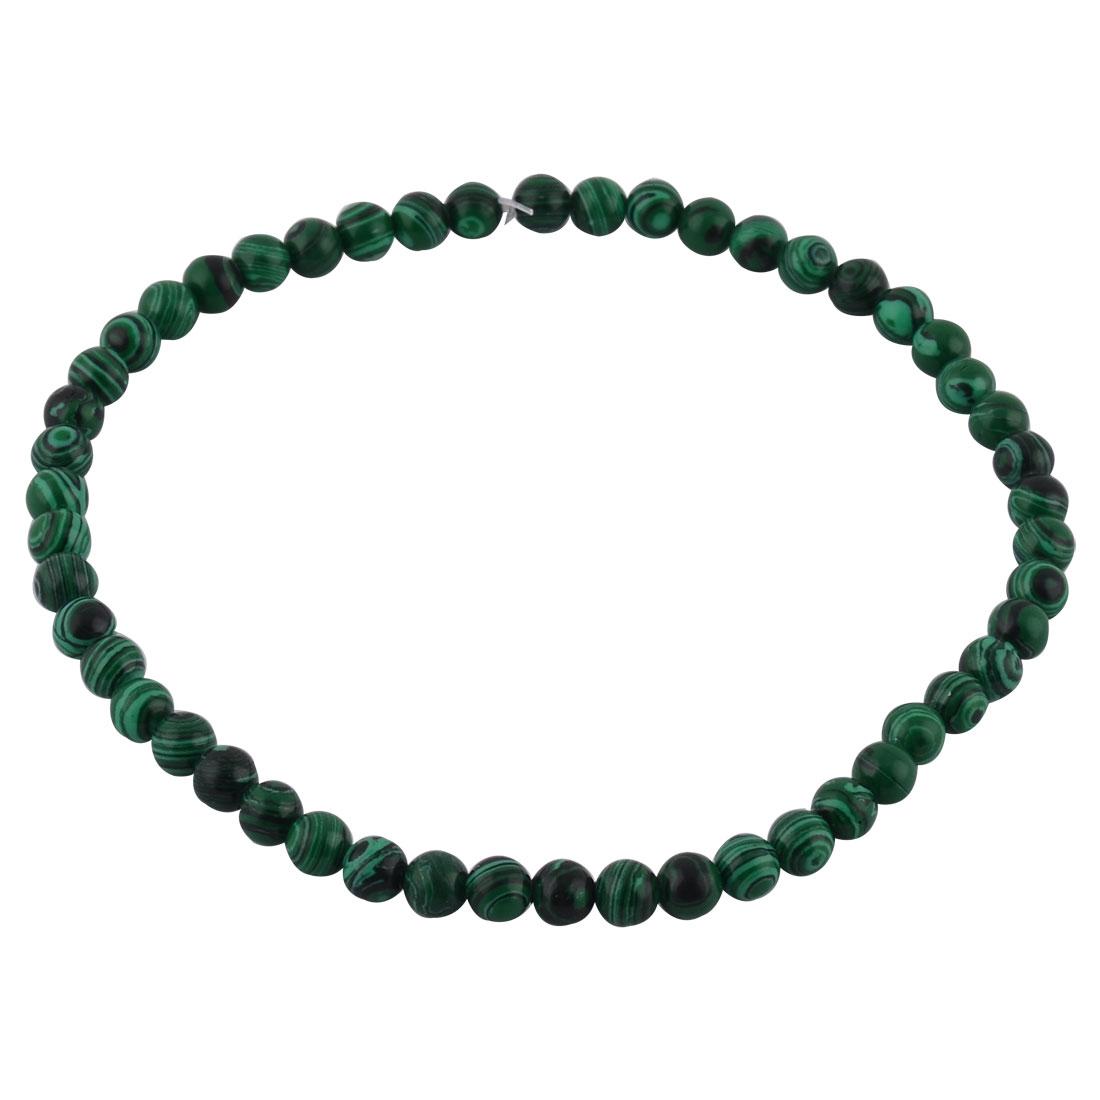 Malachite Design DIY Necklace Bracelet Beading Beads Strand 8mm Dia